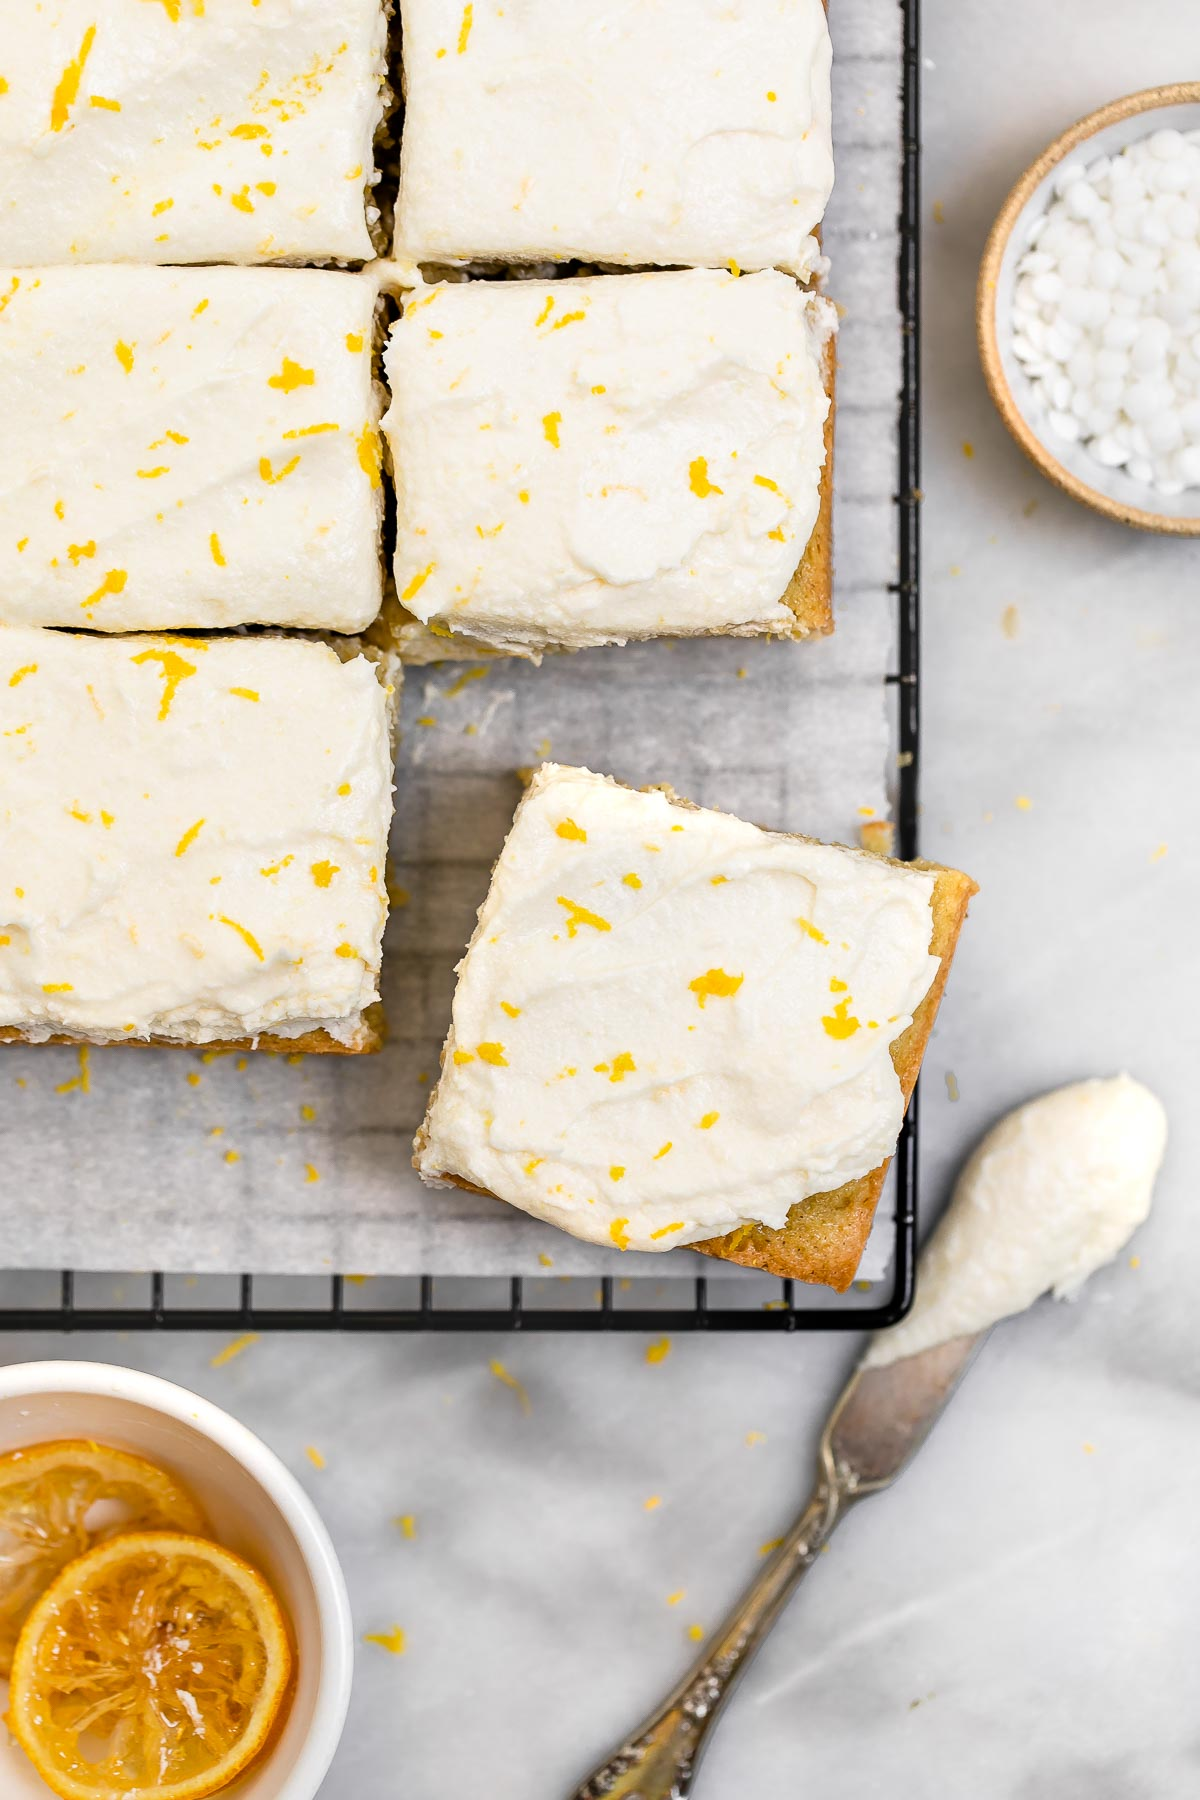 Gluten free lemon cake sliced into squares.